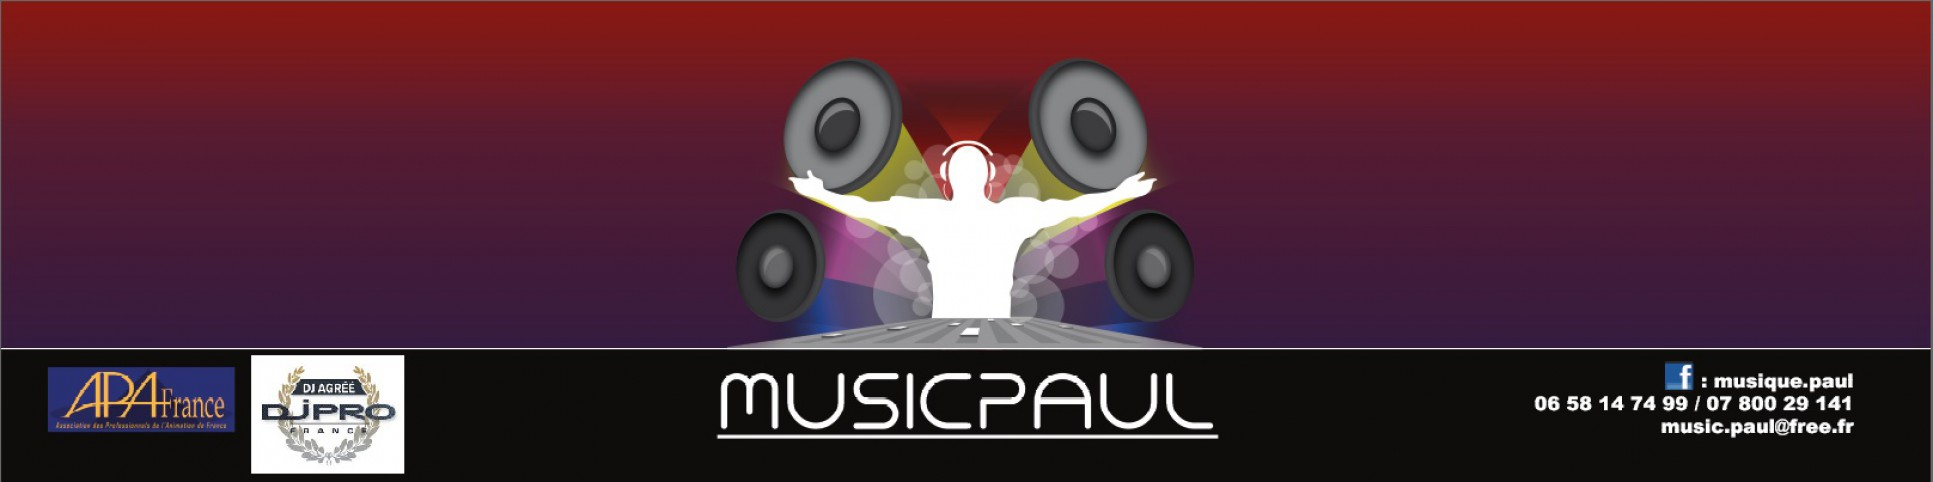 MUSIC PAUL ANIMATION